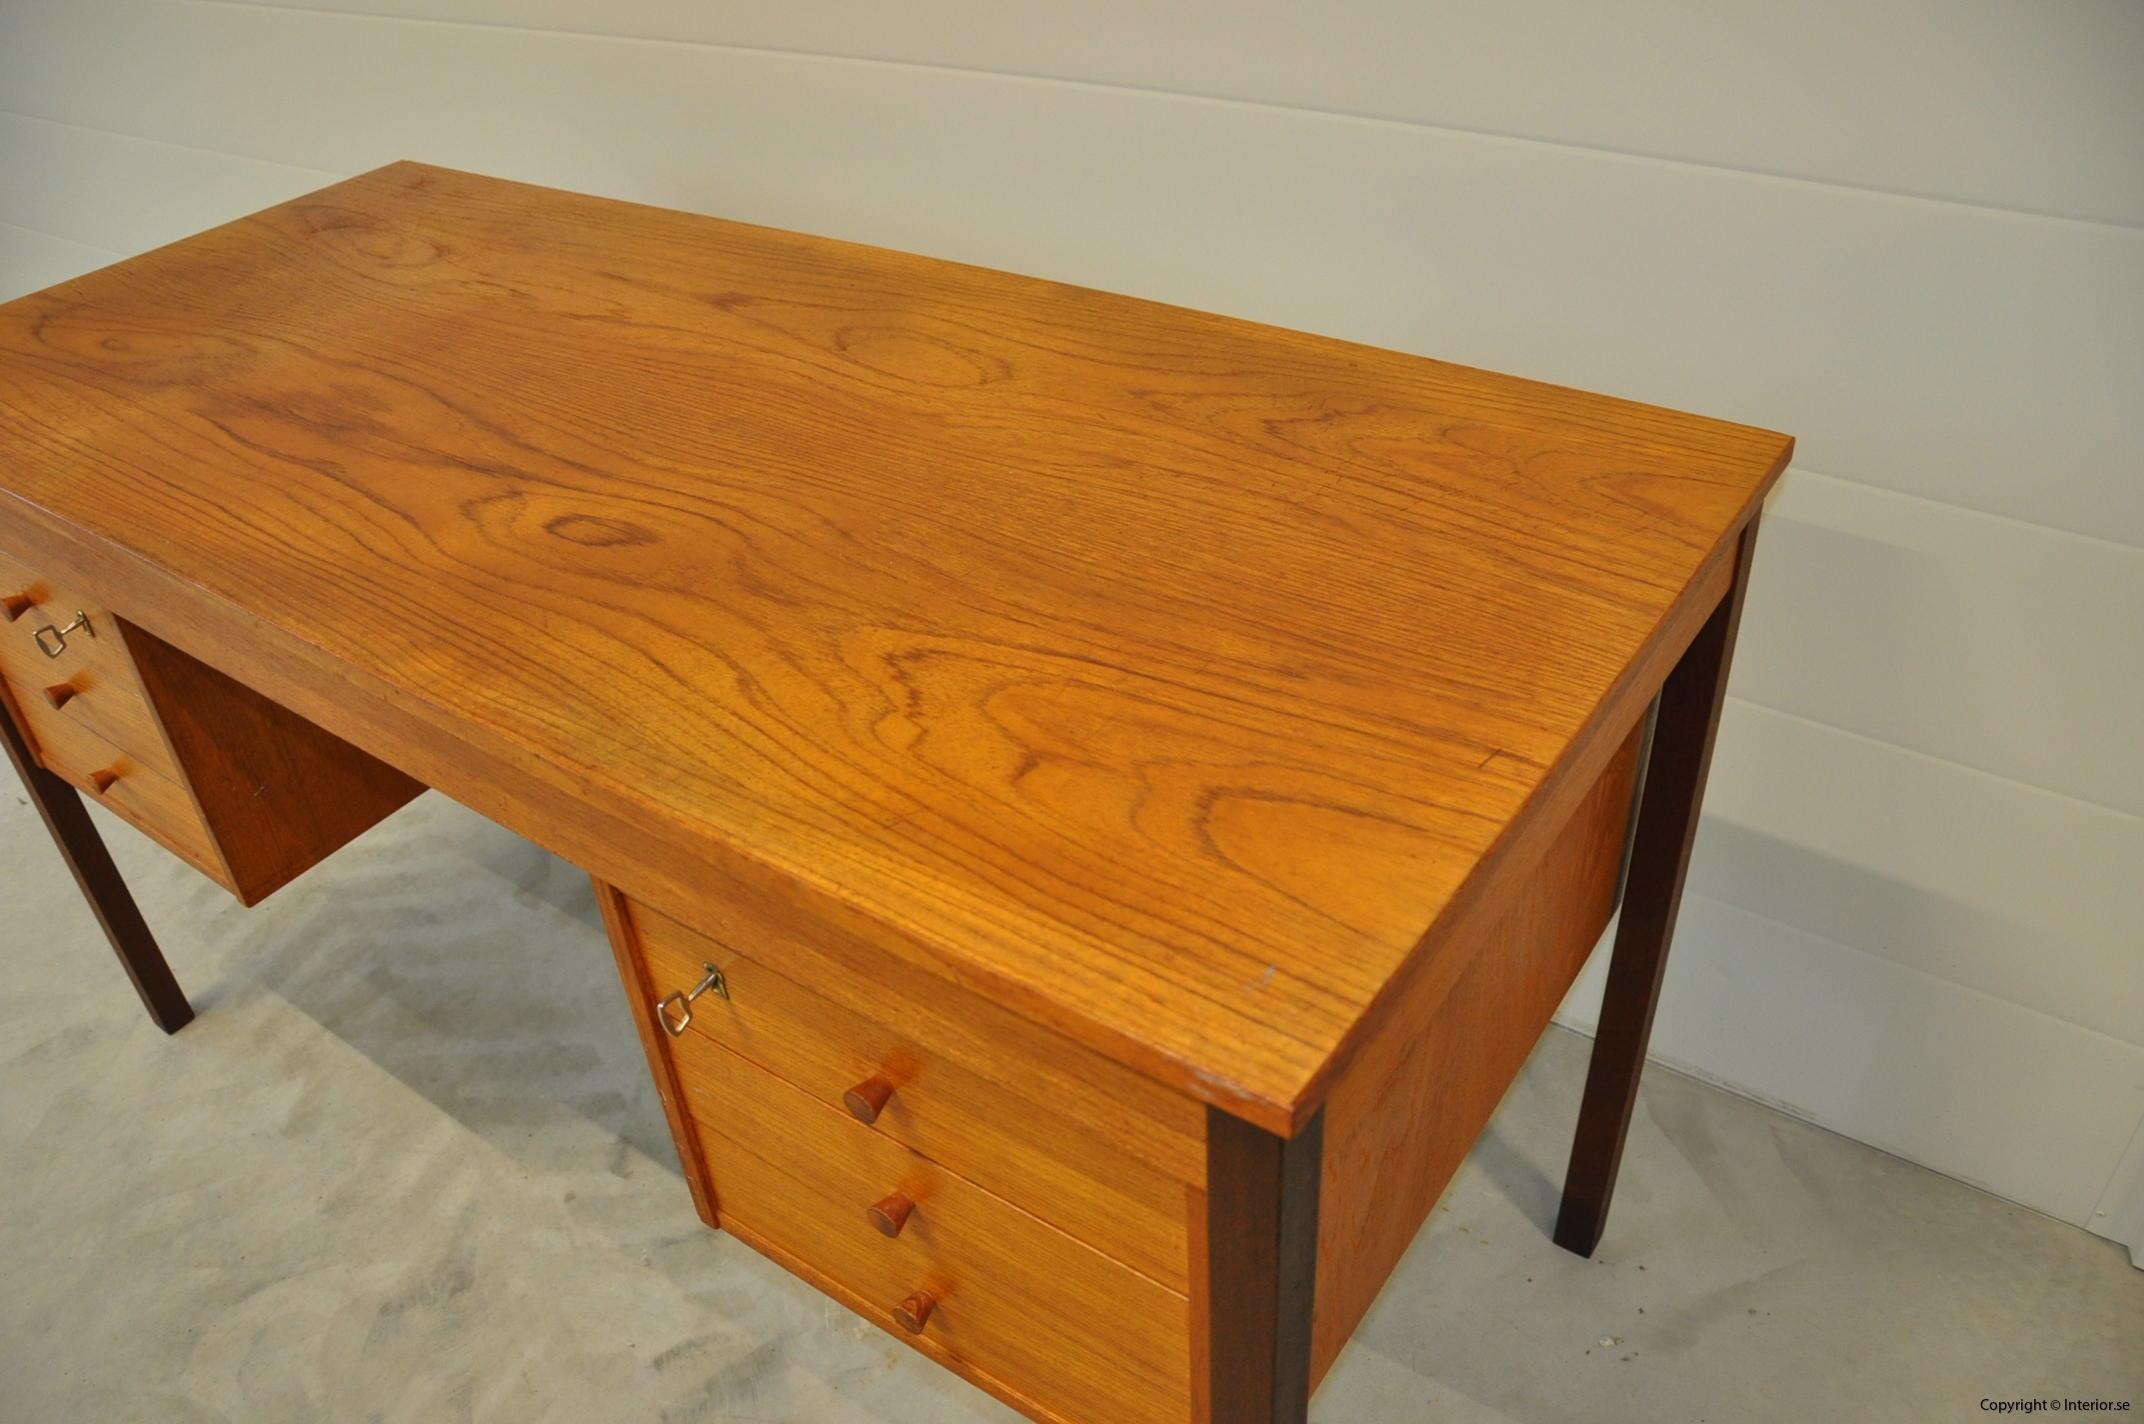 Vintage Scandinavian Desk Domino Møbler Denmark Nordic Design (11)